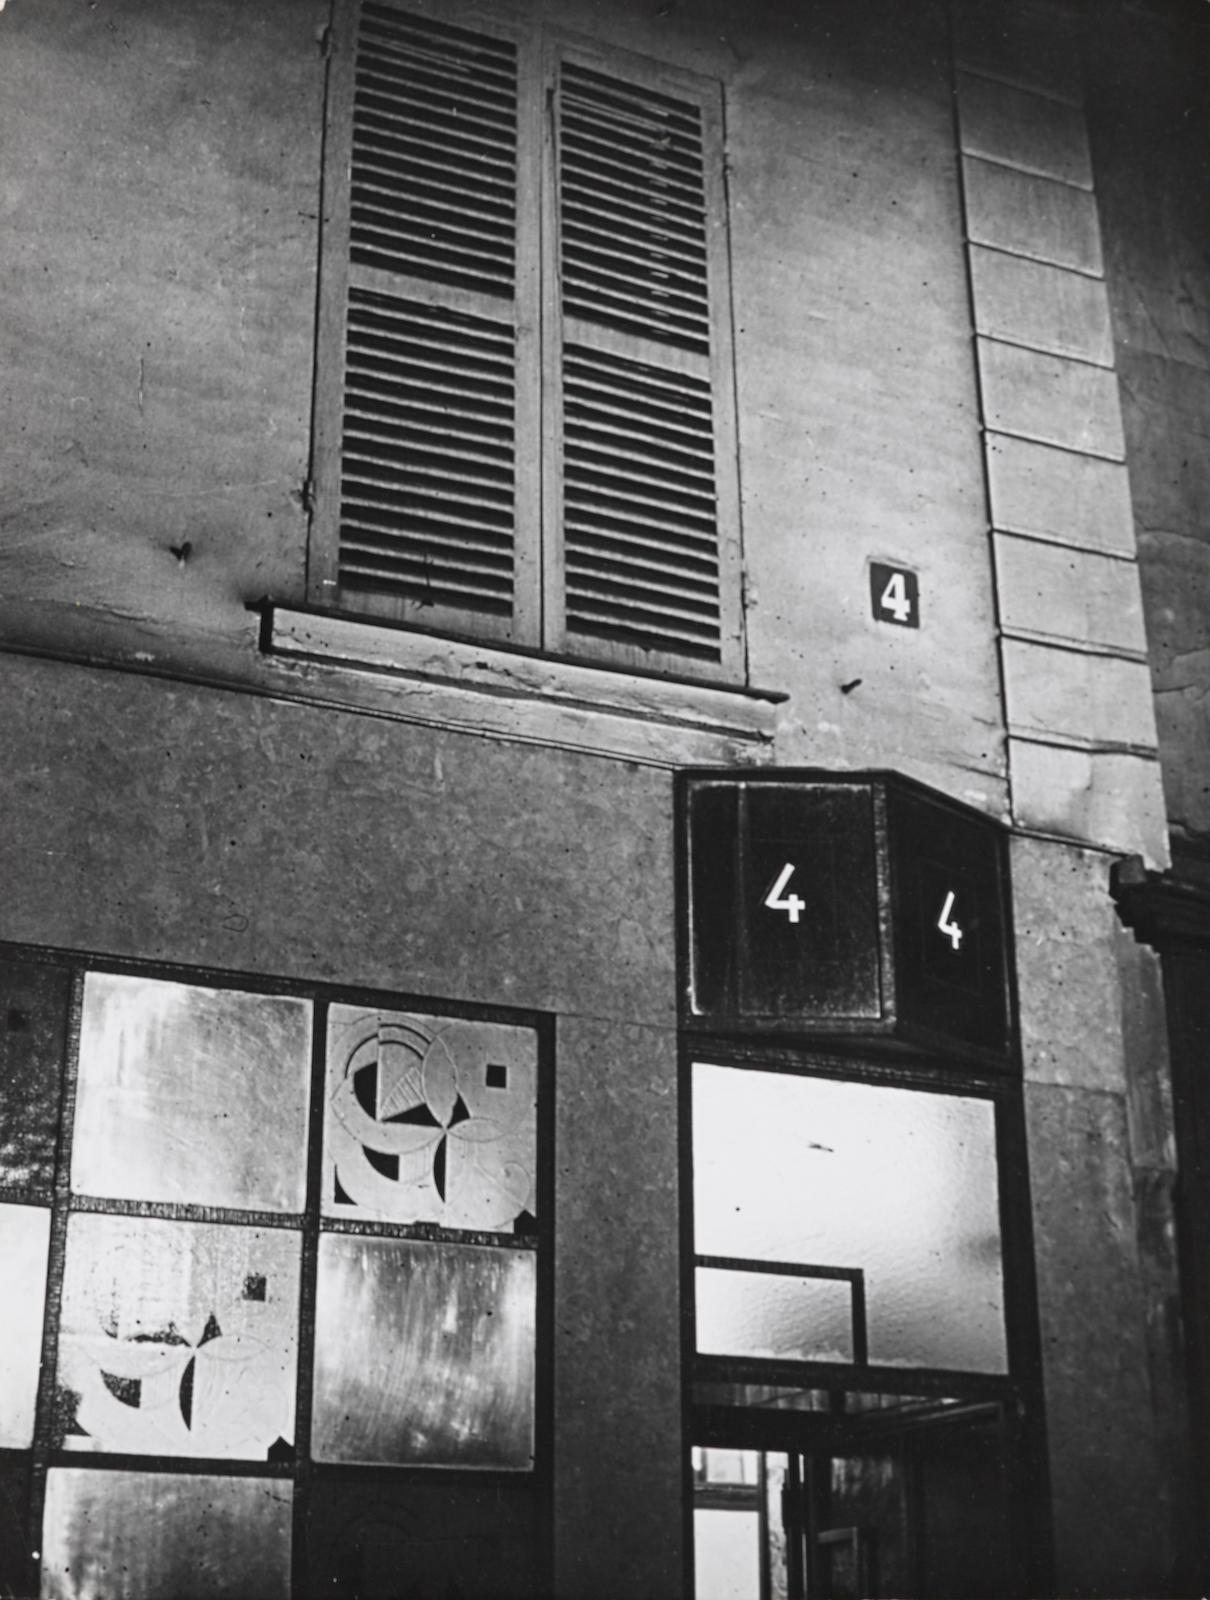 Brassai-Avant-garde brothel-1931